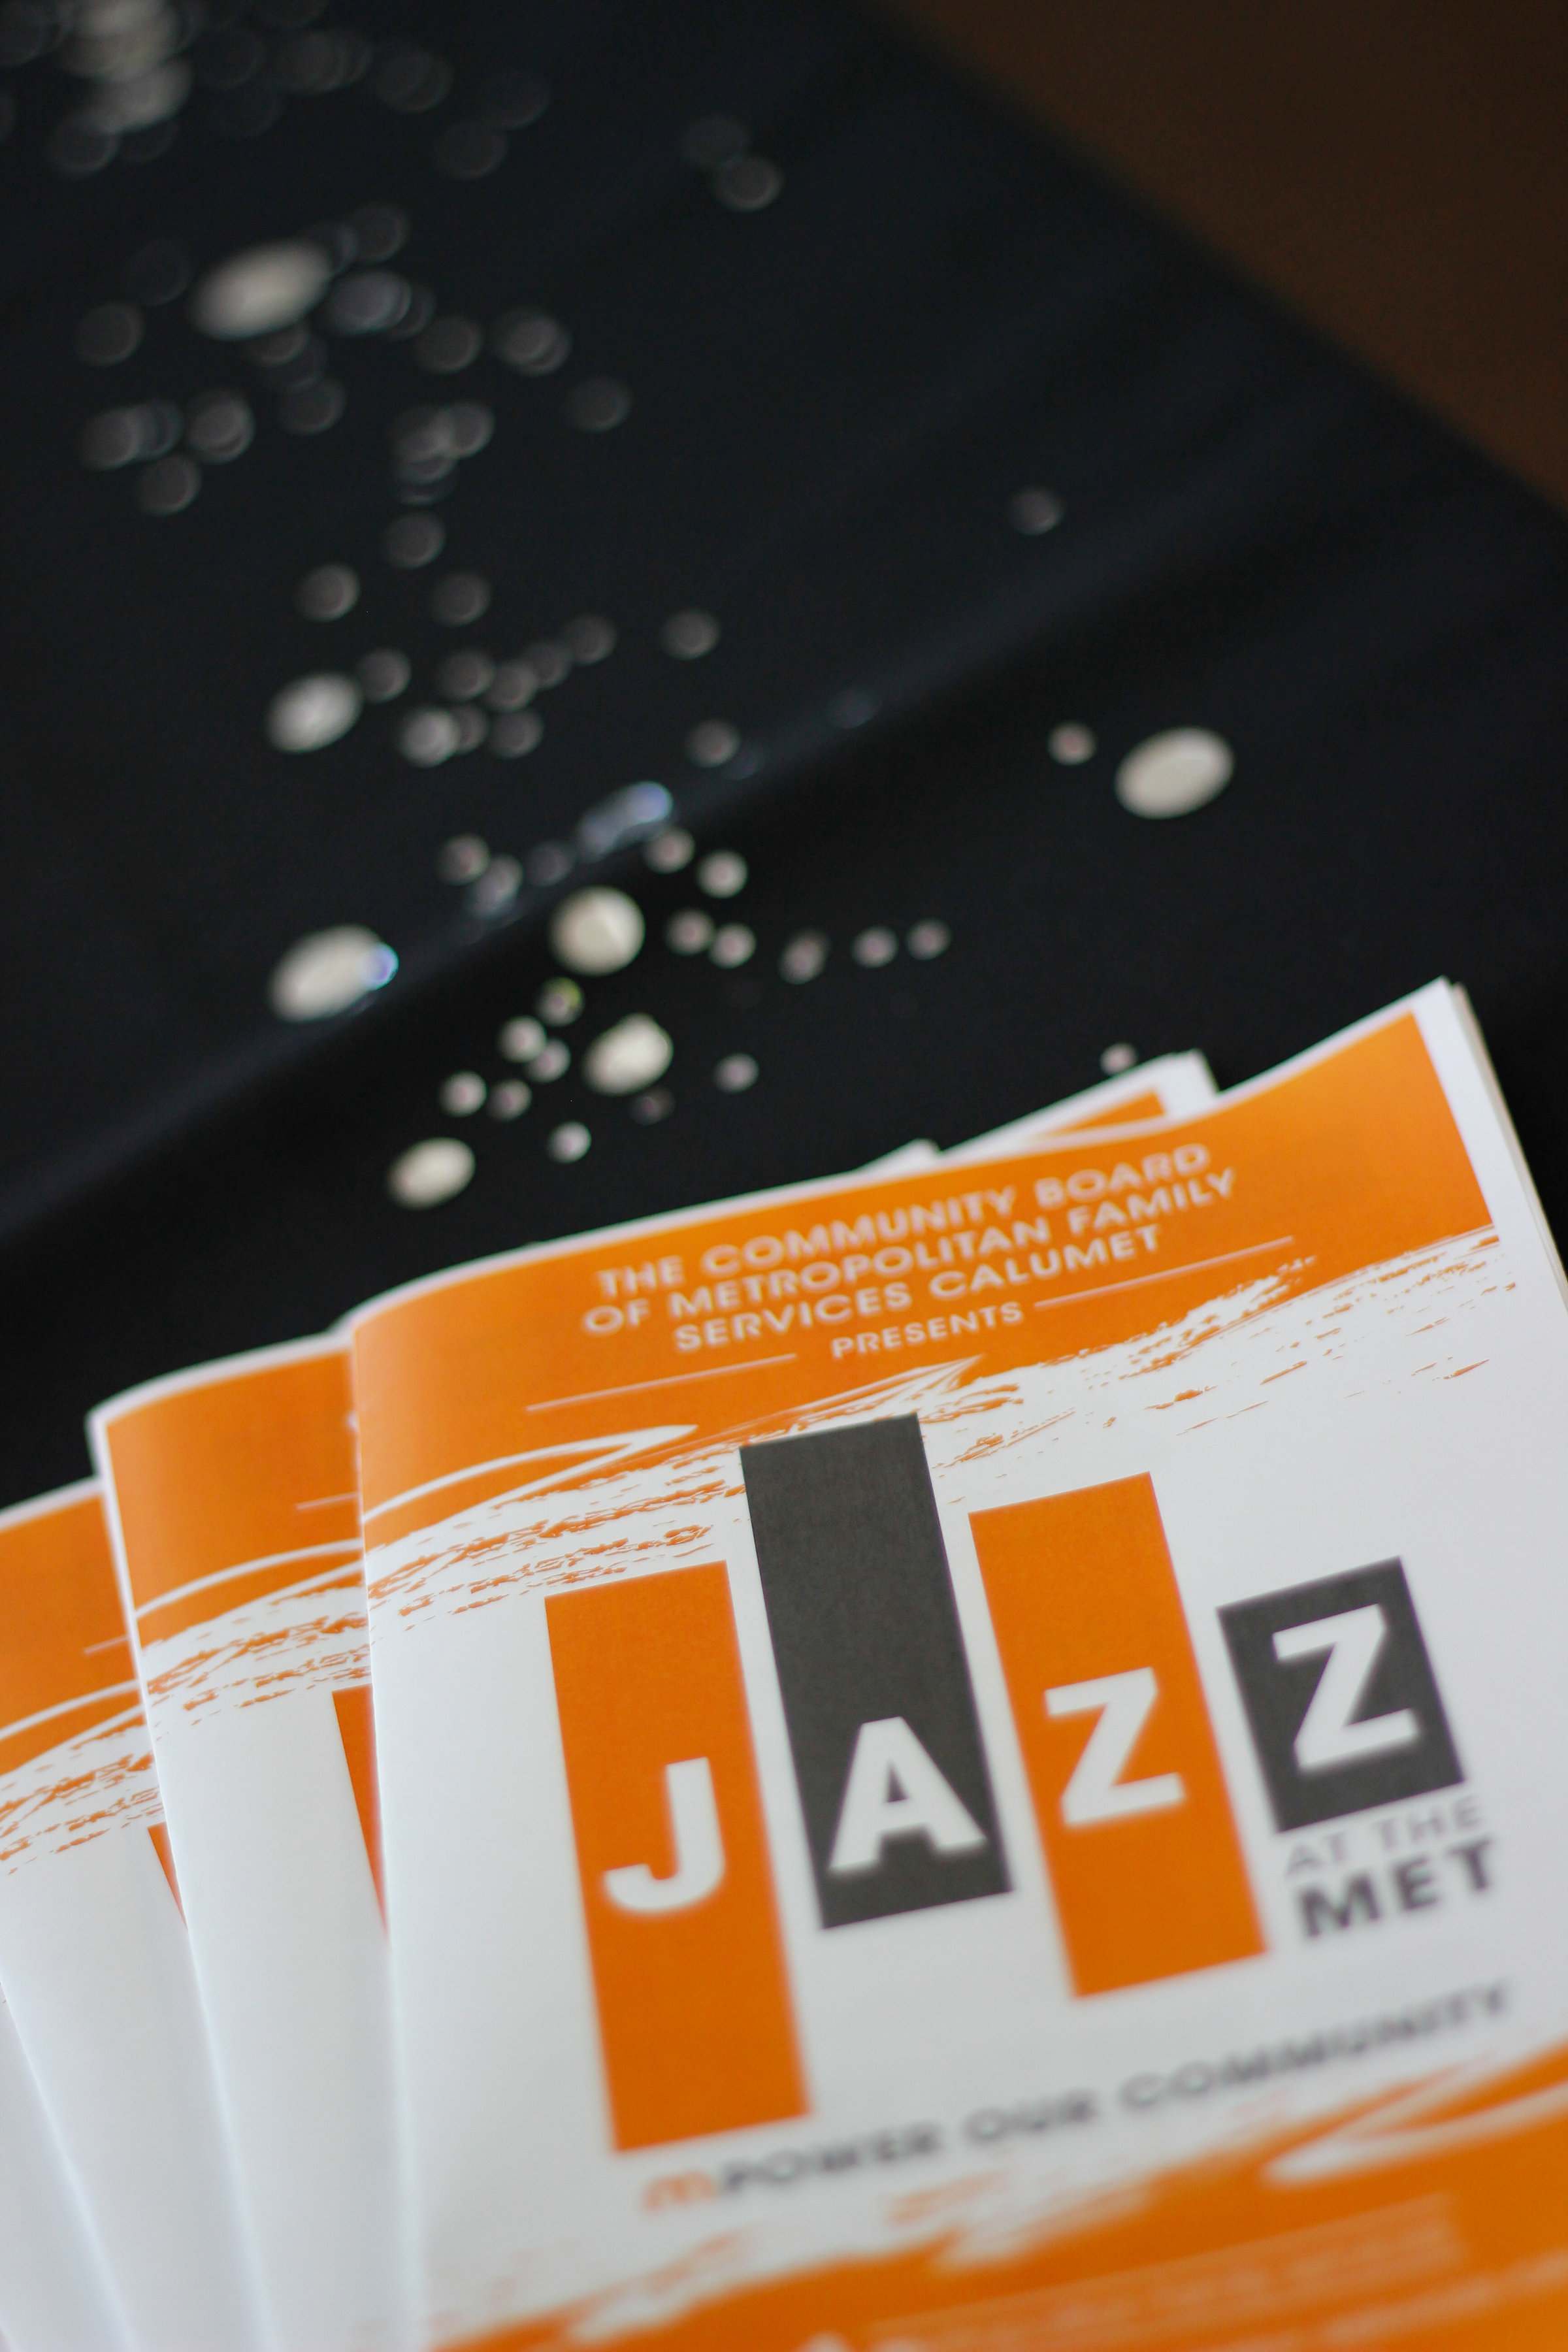 jazzatthemet_2016_0036.jpg